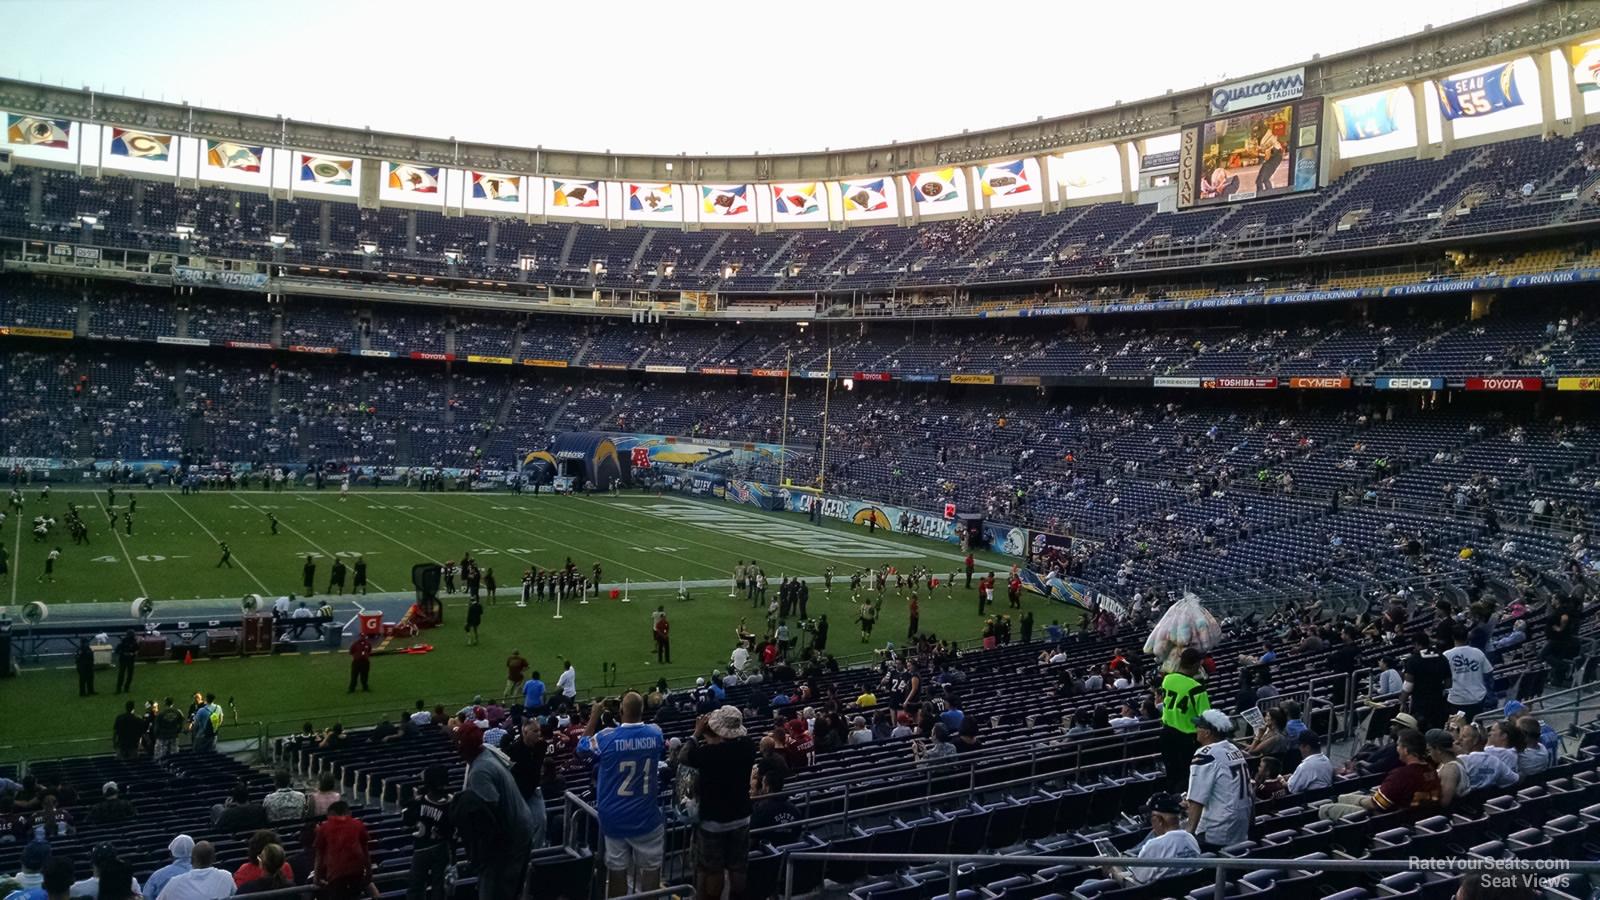 Qualcomm Stadium Plaza 6 Rateyourseats Com